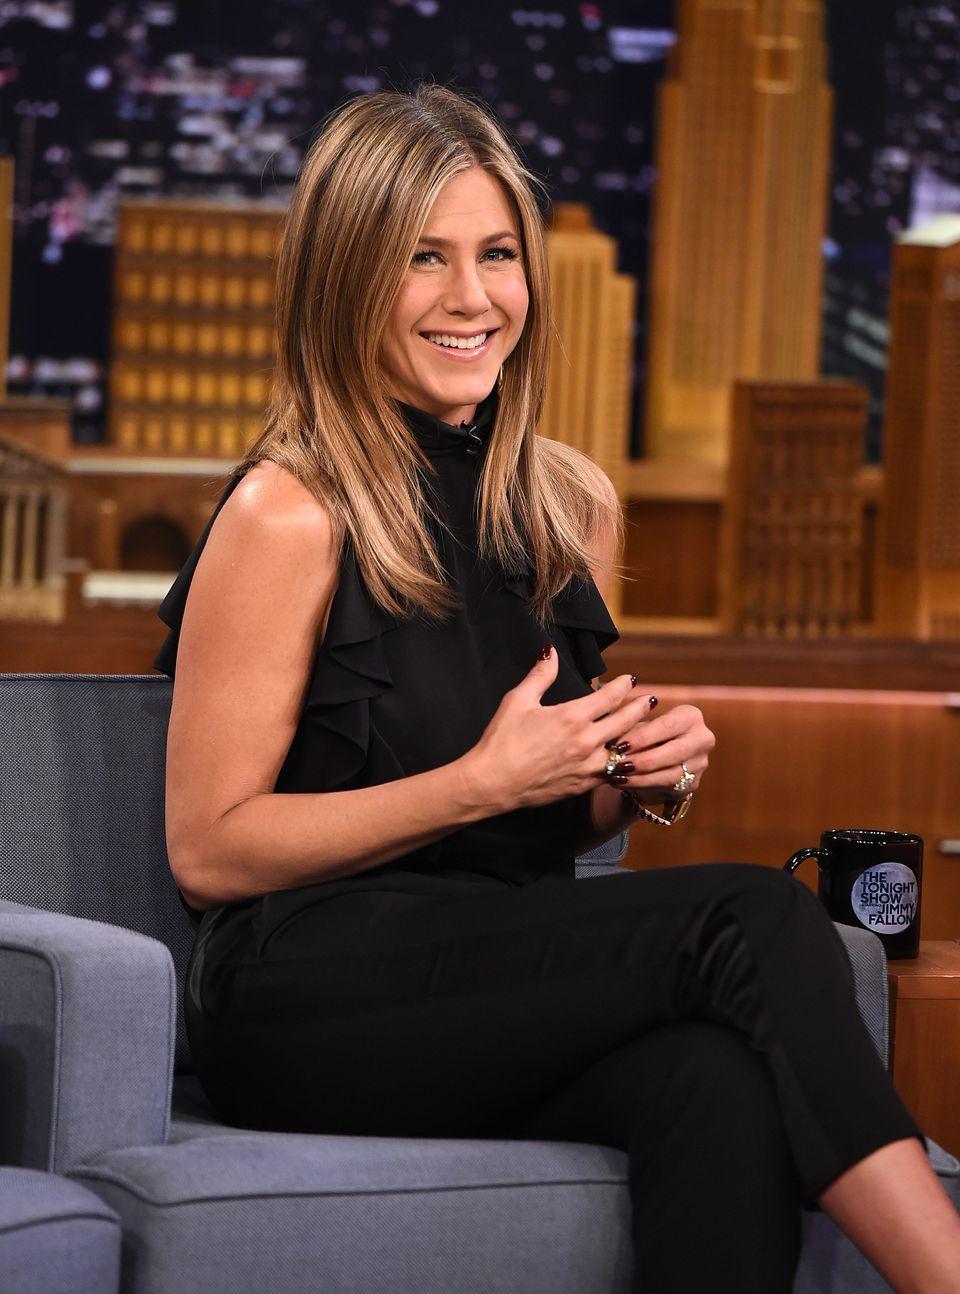 NEW YORK, NY - JANUARY 21:  Jennifer Aniston Visits 'The Tonight Show Starring Jimmy Fallon' at Rockefeller Center on January